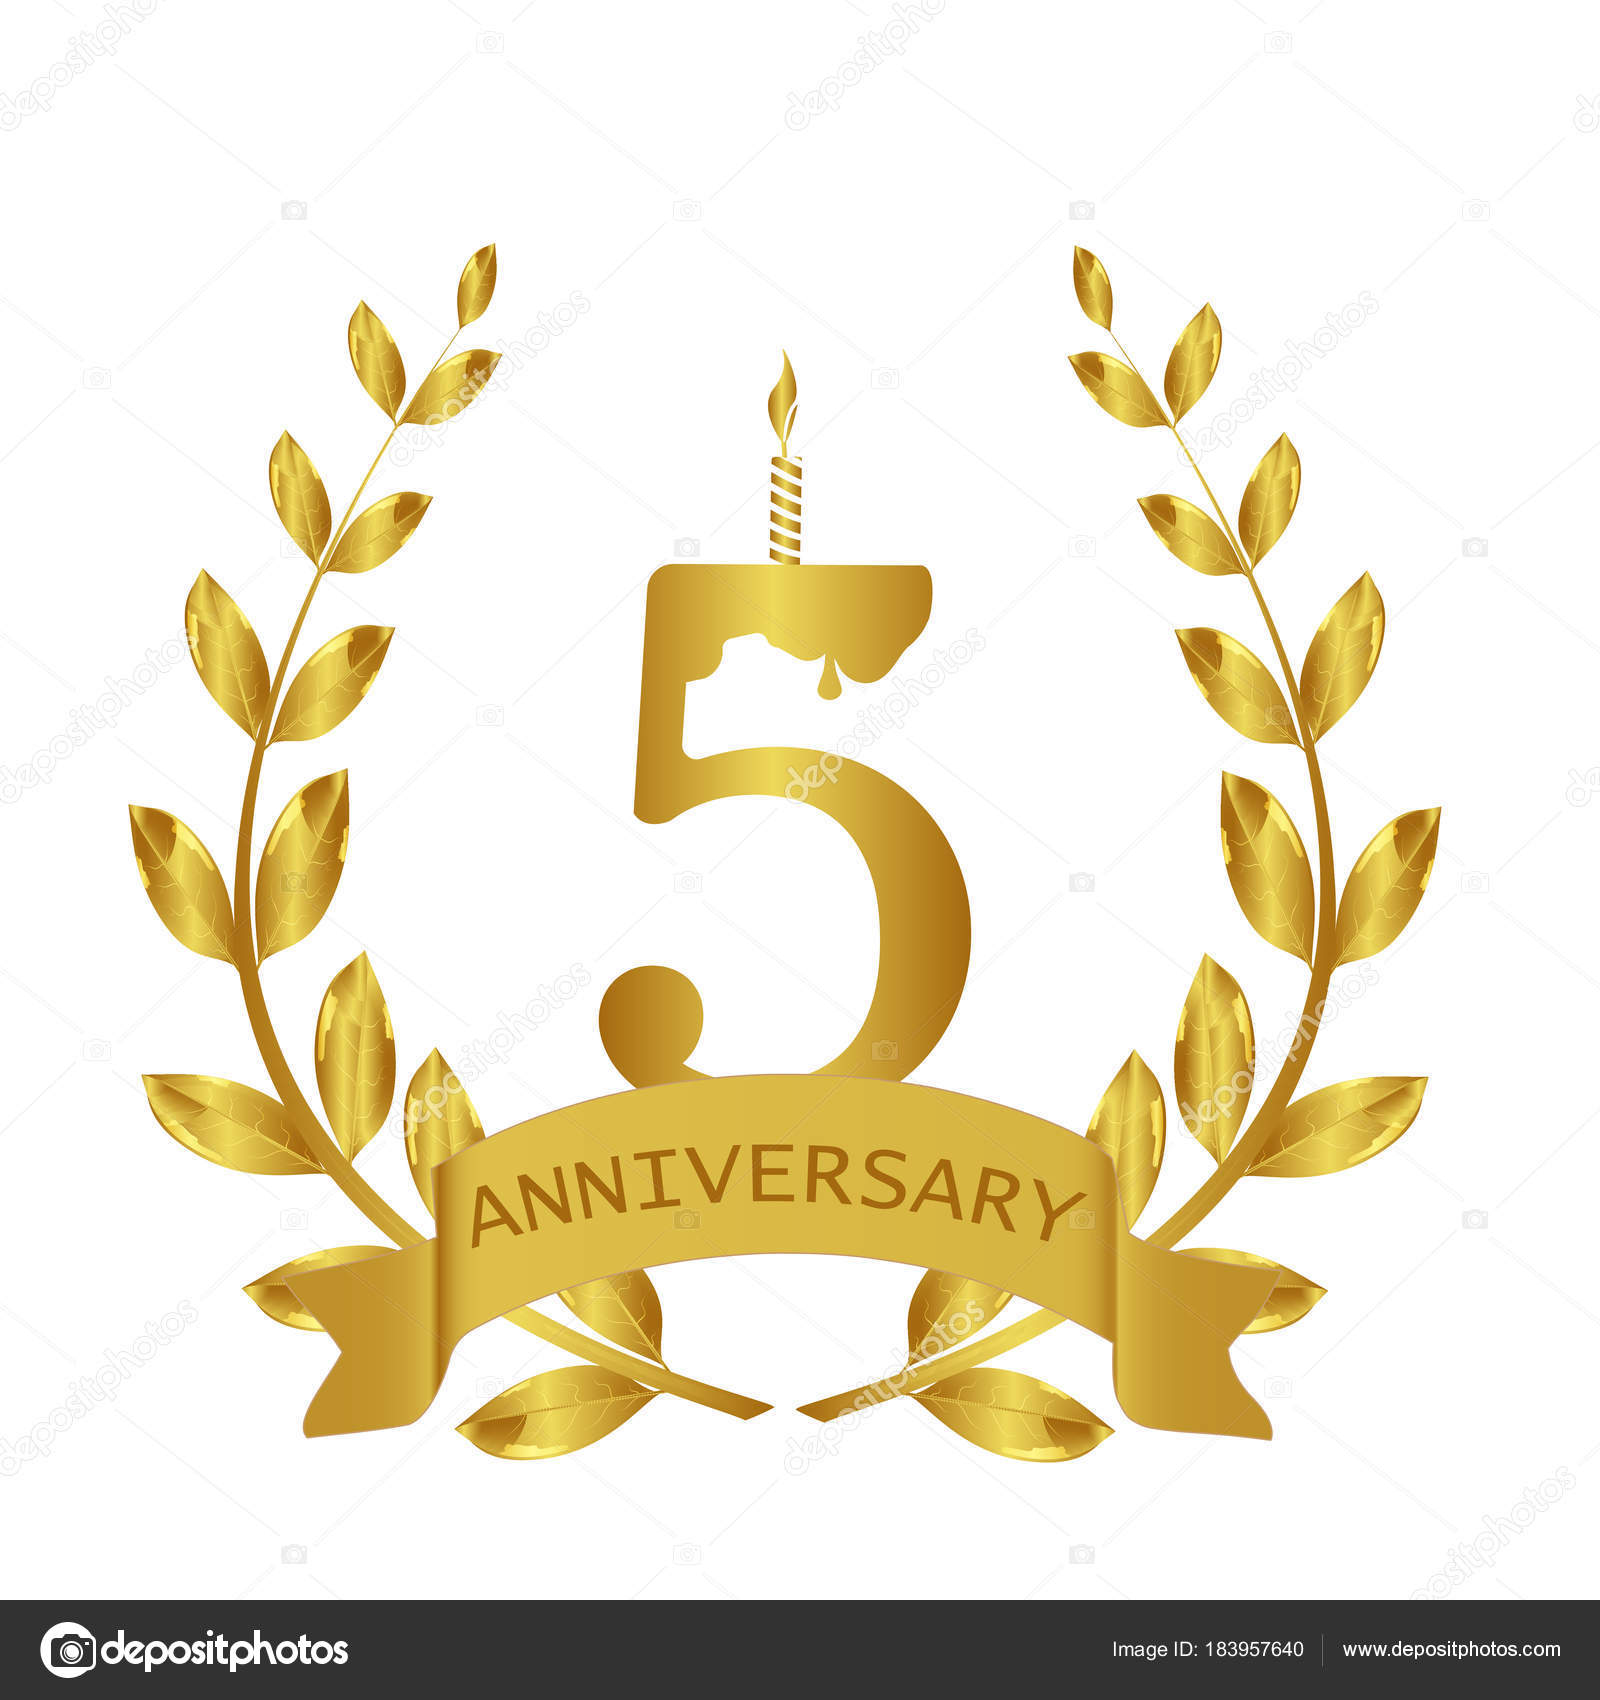 Anniversary 5 years 5th birthday wreath gold stock vector anniversary 5 years 5th birthday wreath gold vector by oksanadesign biocorpaavc Gallery